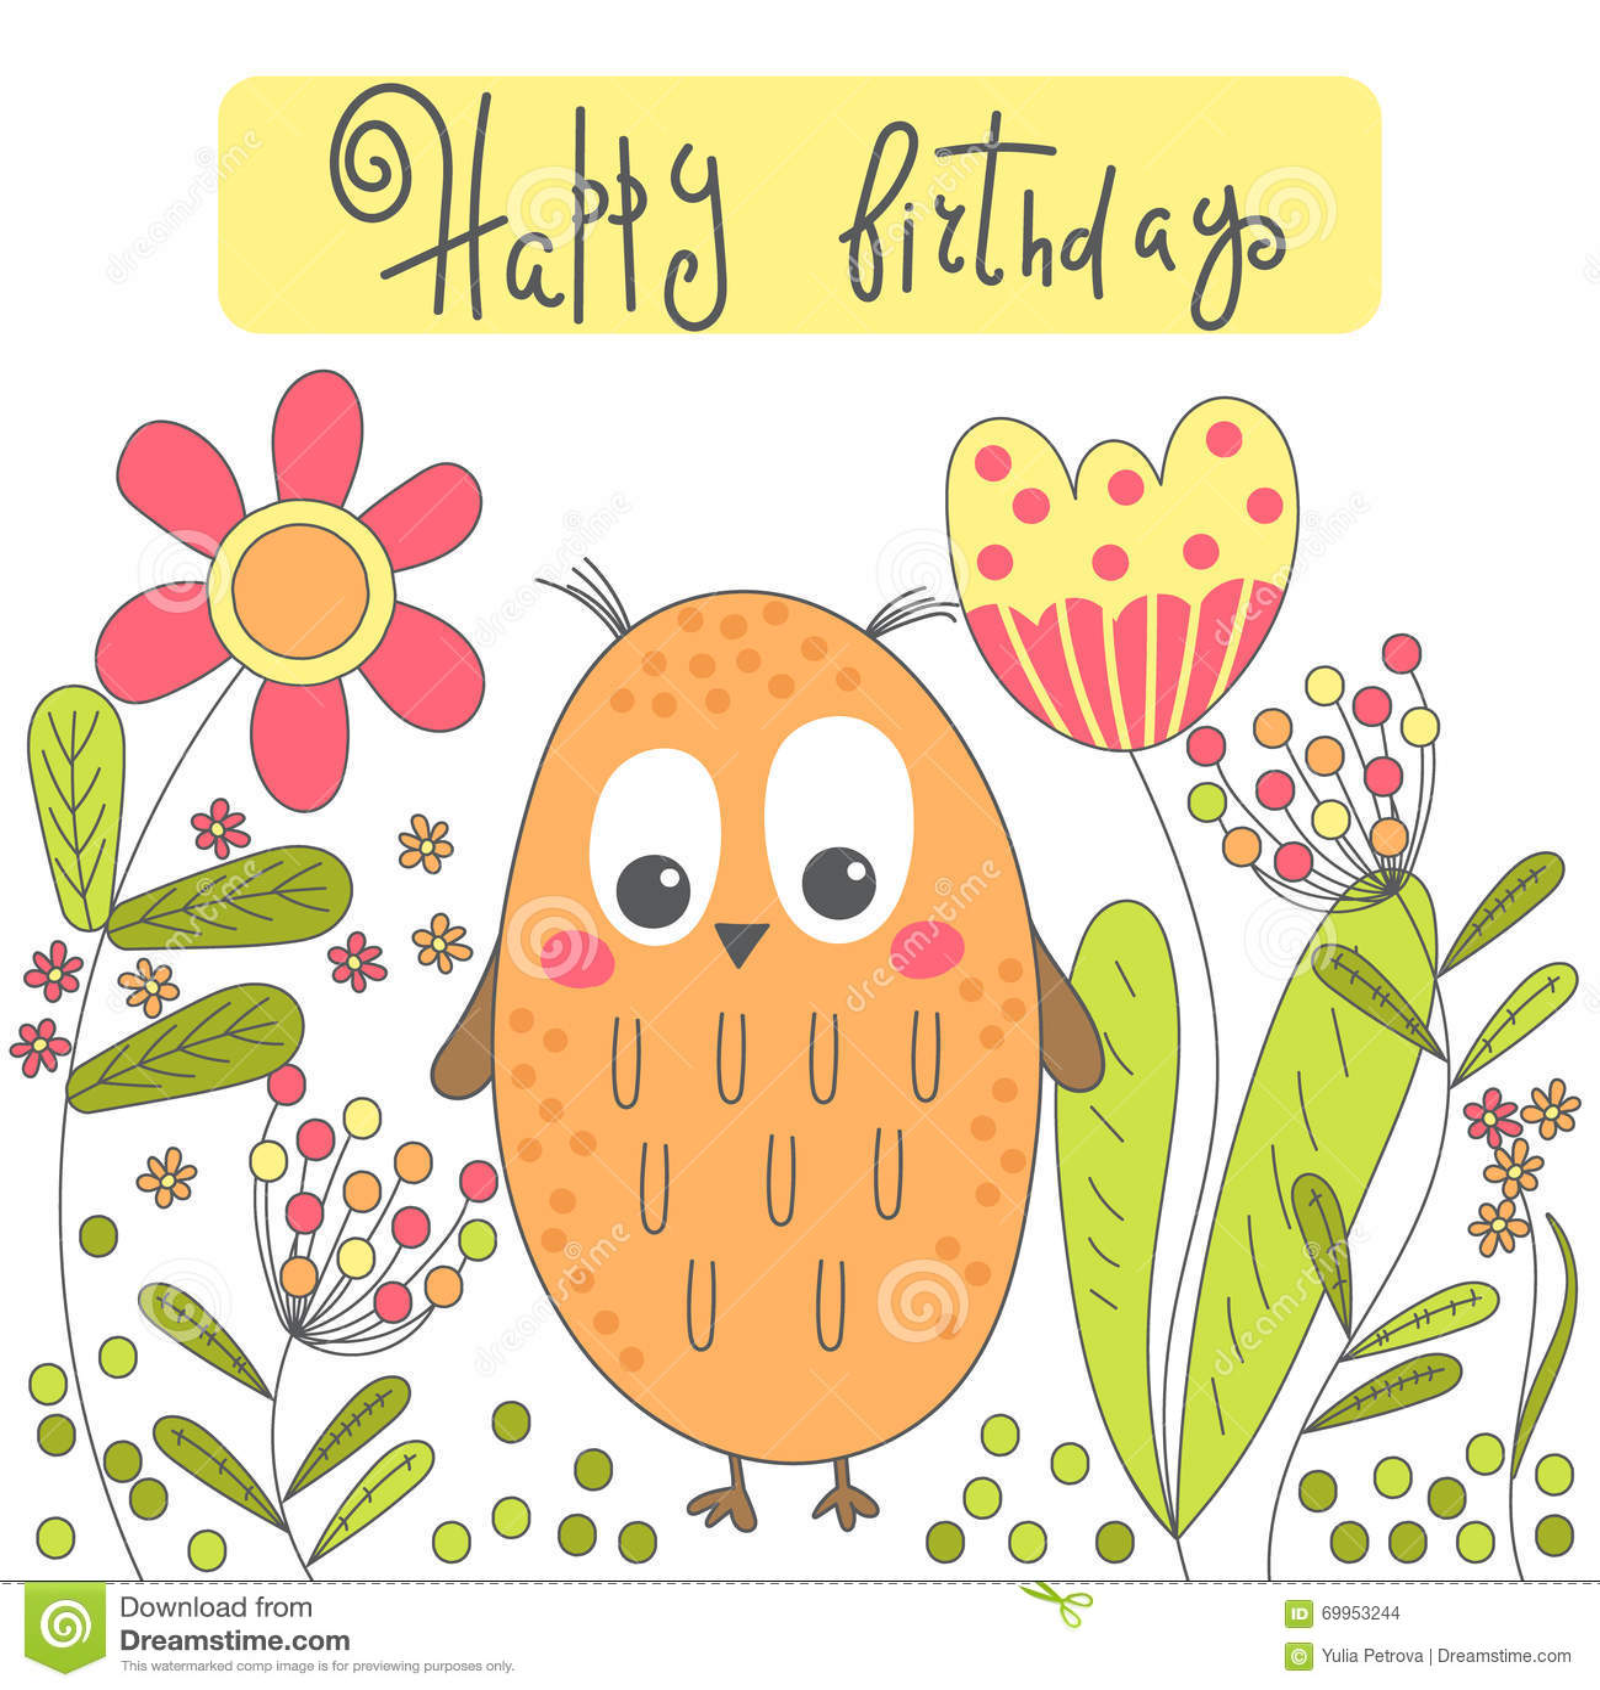 Birthday Card With Cartoon Owl And Flowers Stock Vector